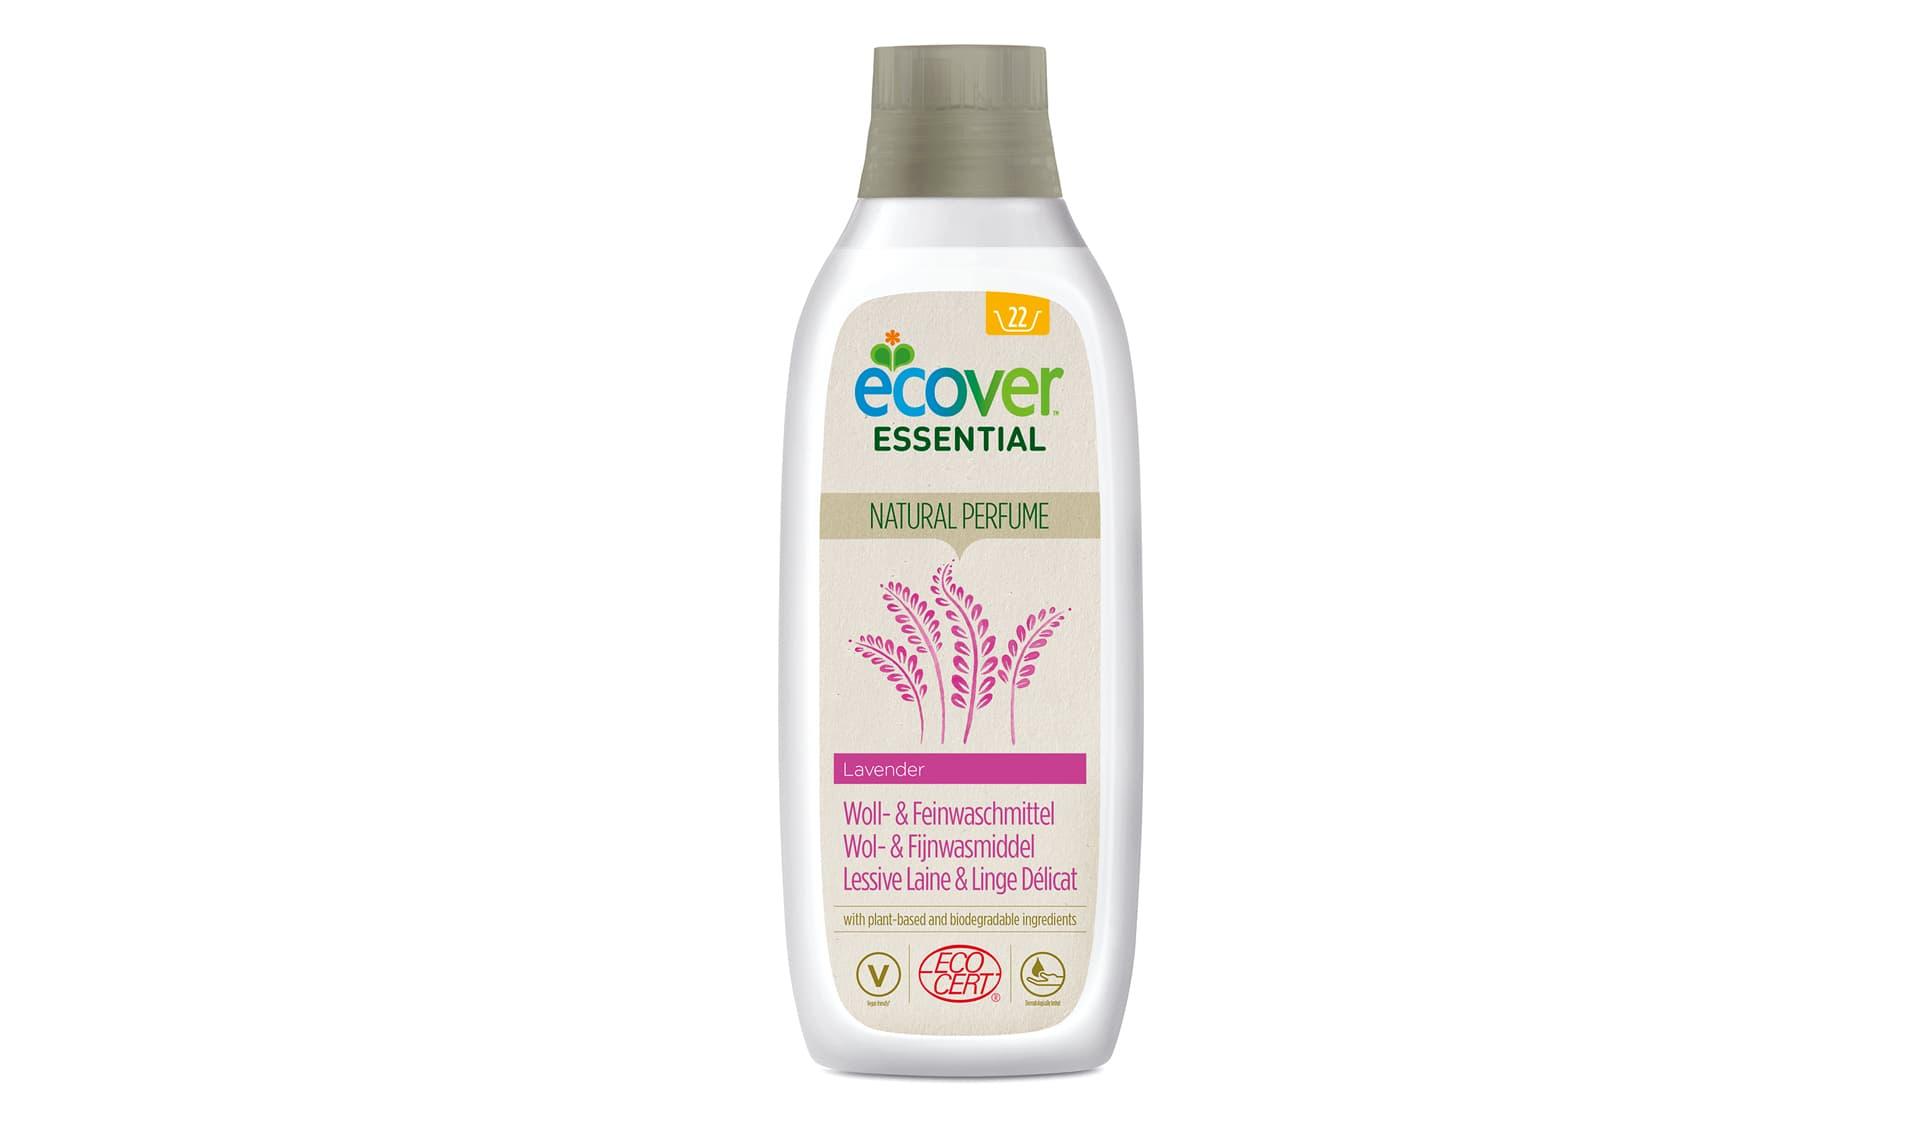 Ecover (www.ecover.de) Essential Woll- und Feinwaschmittel